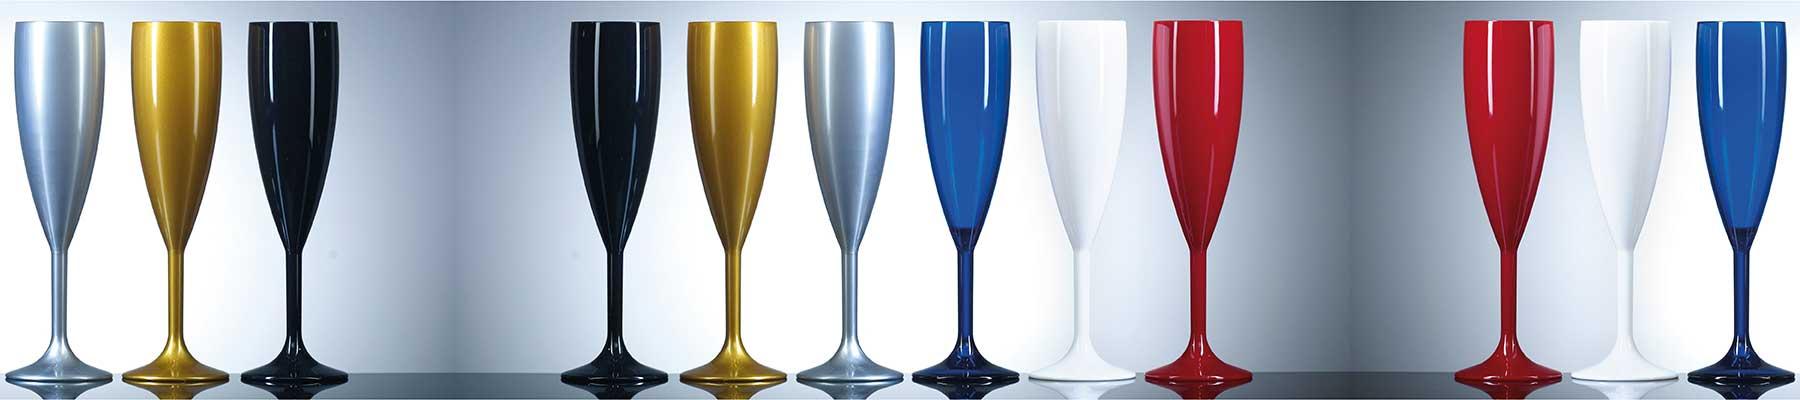 plastic-champagne-flutes